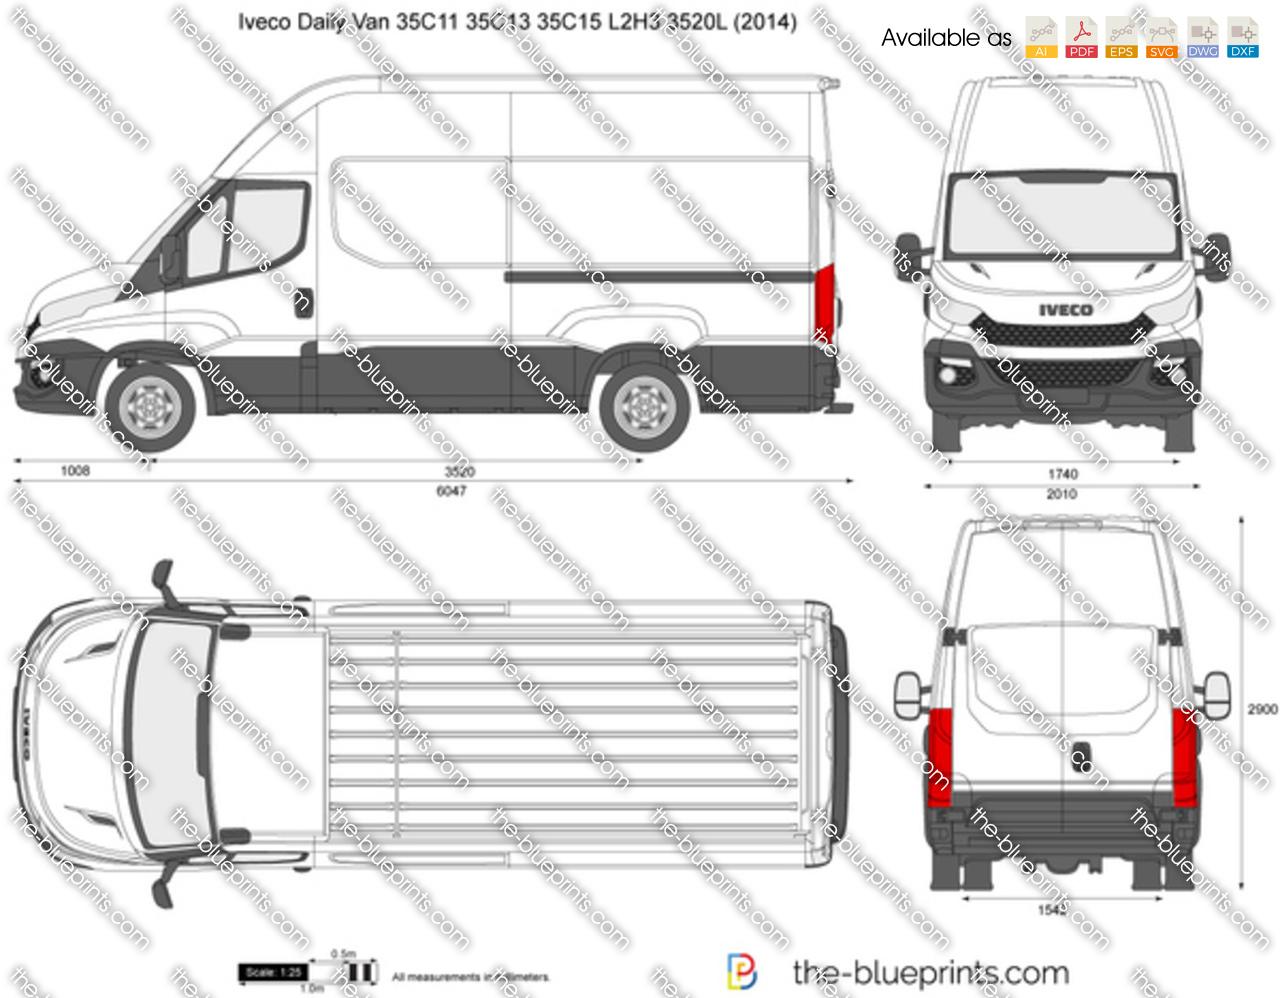 Iveco Daily Van 35C11 35C13 35C15 L2H3 3520L 2015